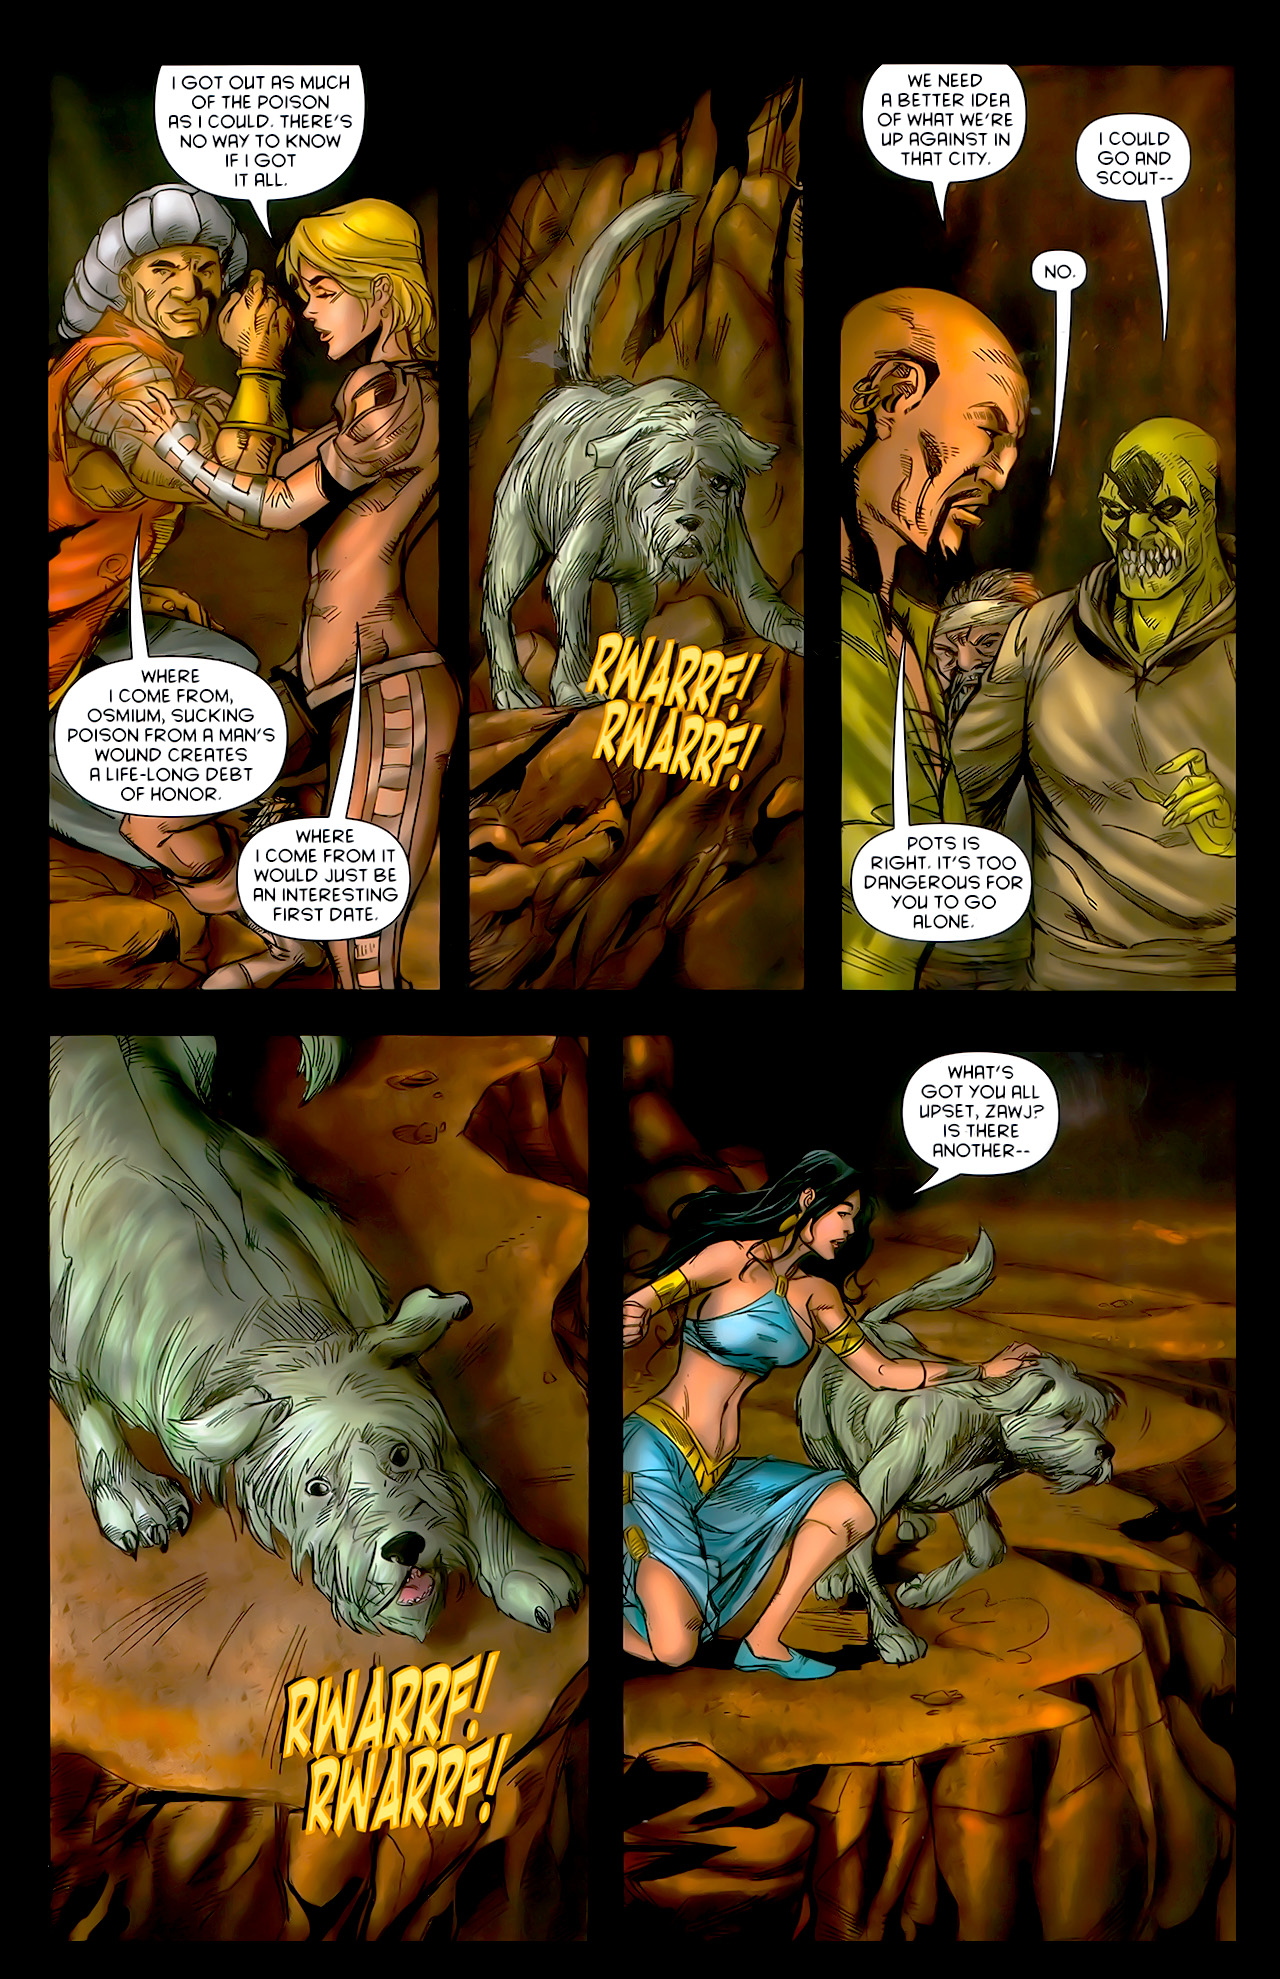 Read online 1001 Arabian Nights: The Adventures of Sinbad comic -  Issue #10 - 23